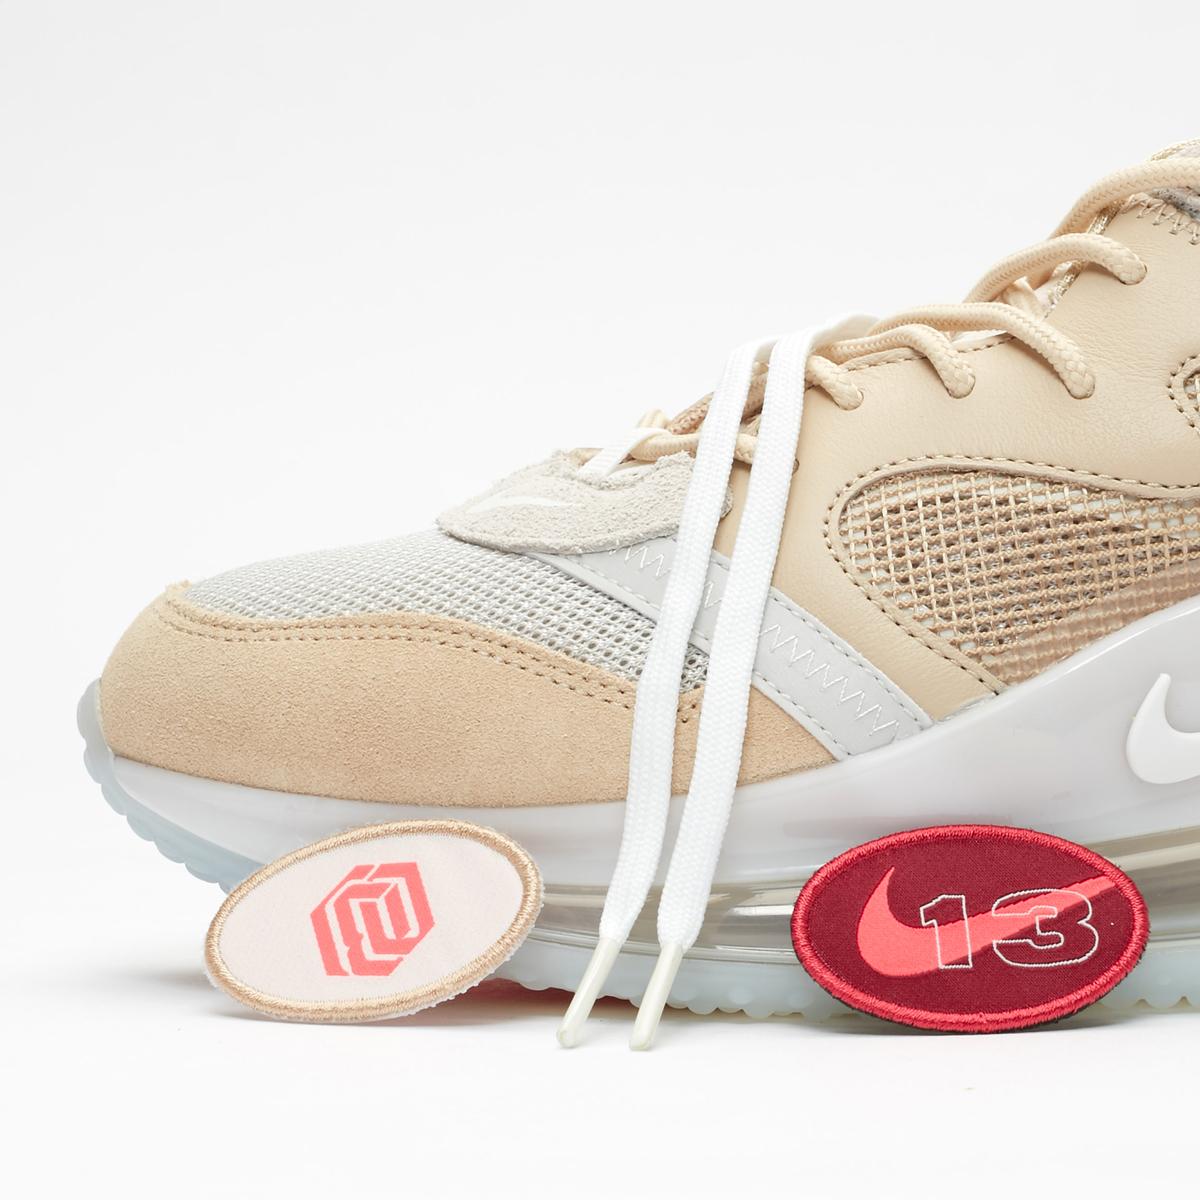 f:id:sneakerscaffetokyo:20190904085505j:plain